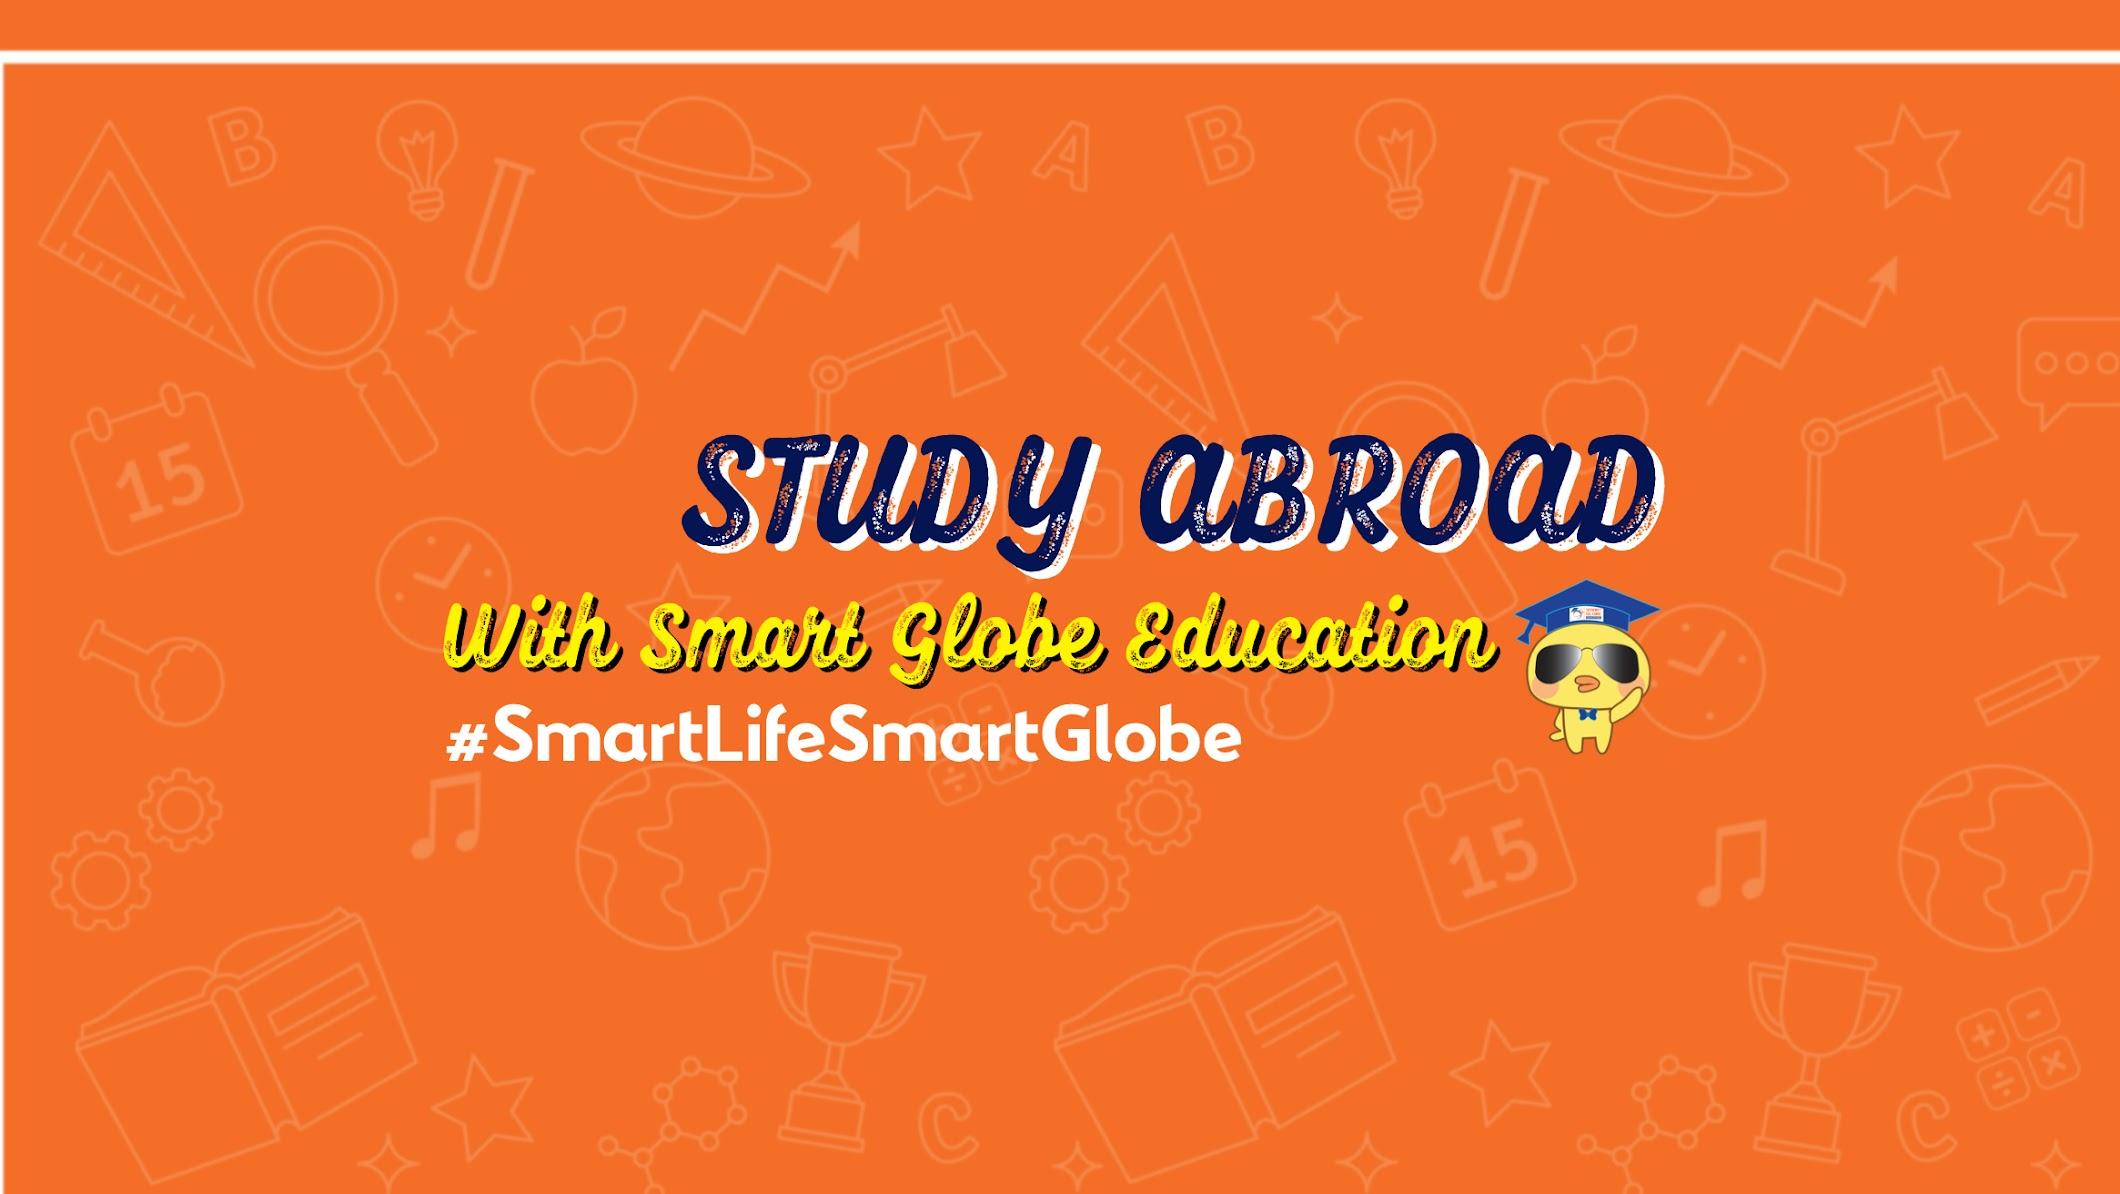 Youtube Channel: SmartGlobeEducation